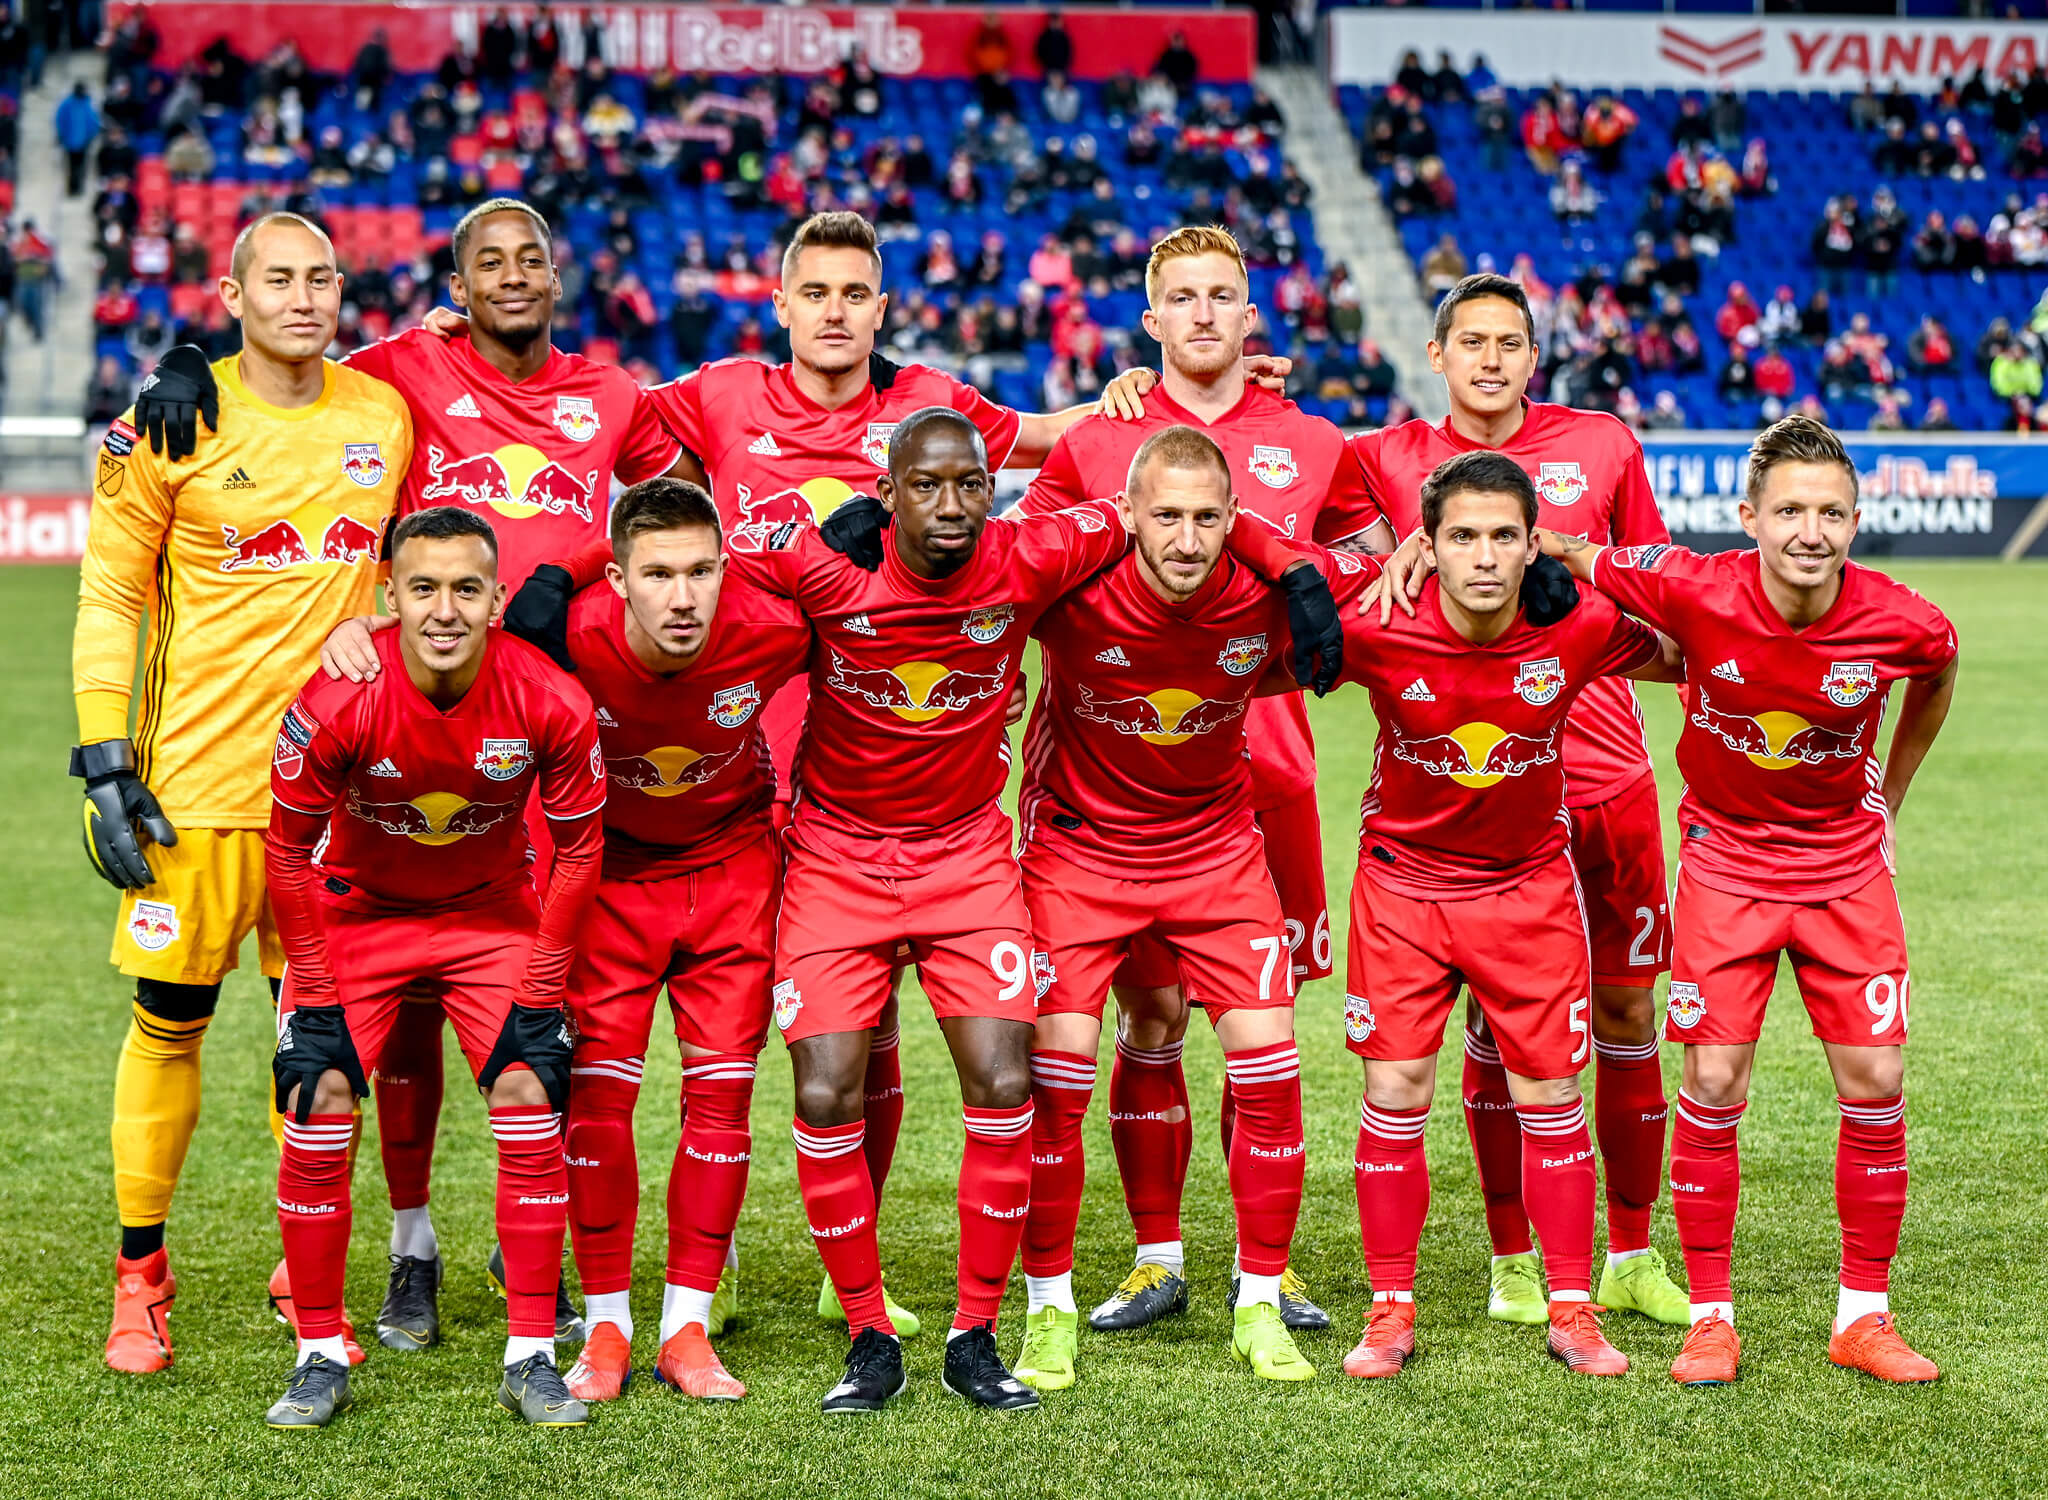 New York Red Bulls soccer players